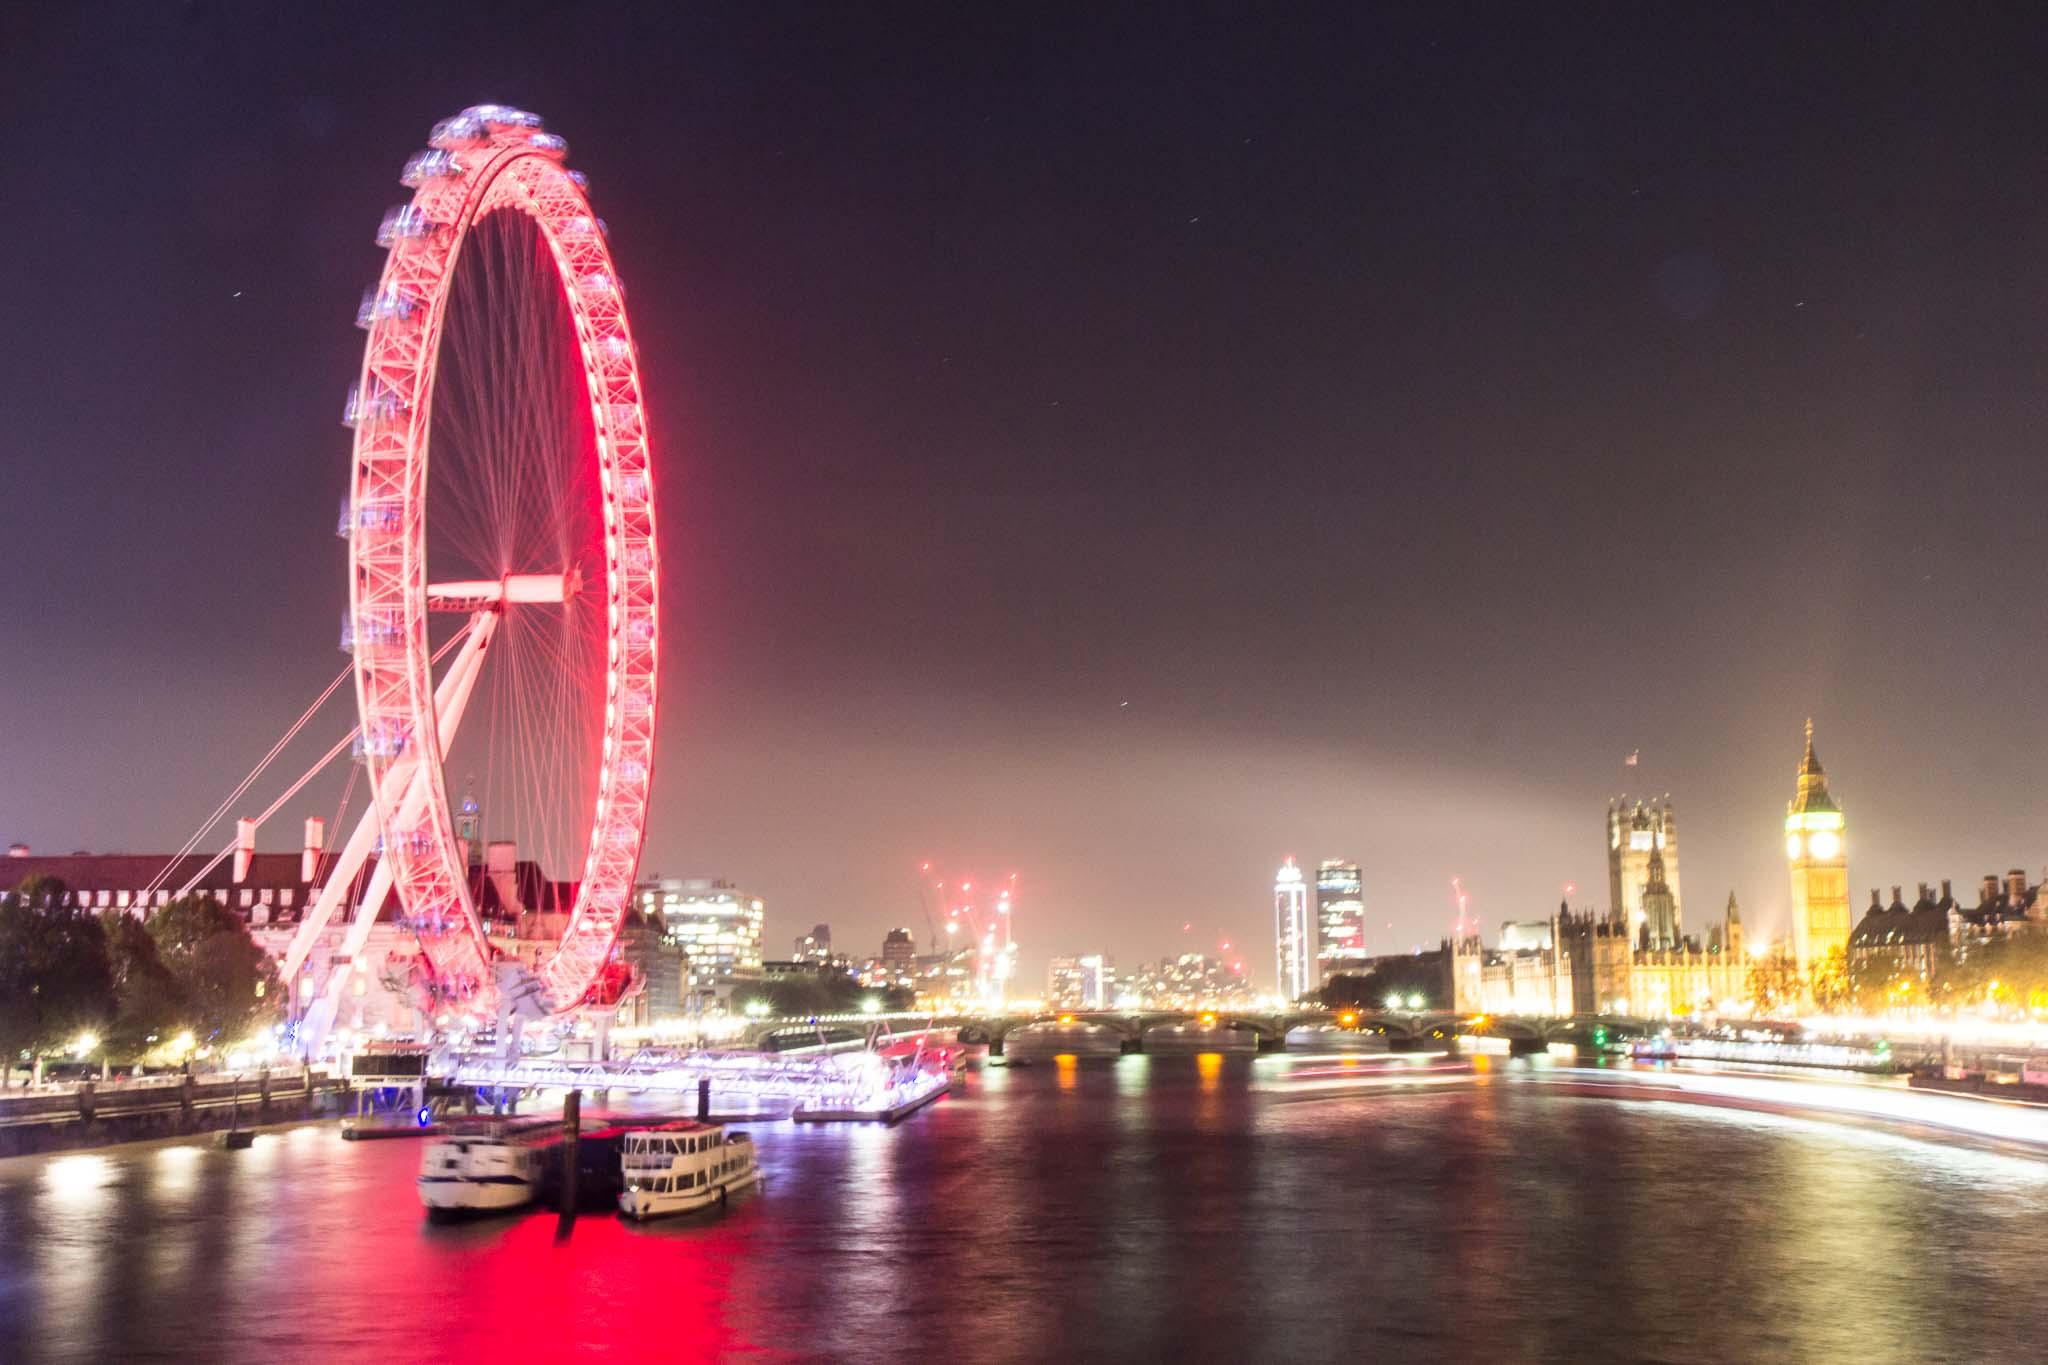 London night photography tour